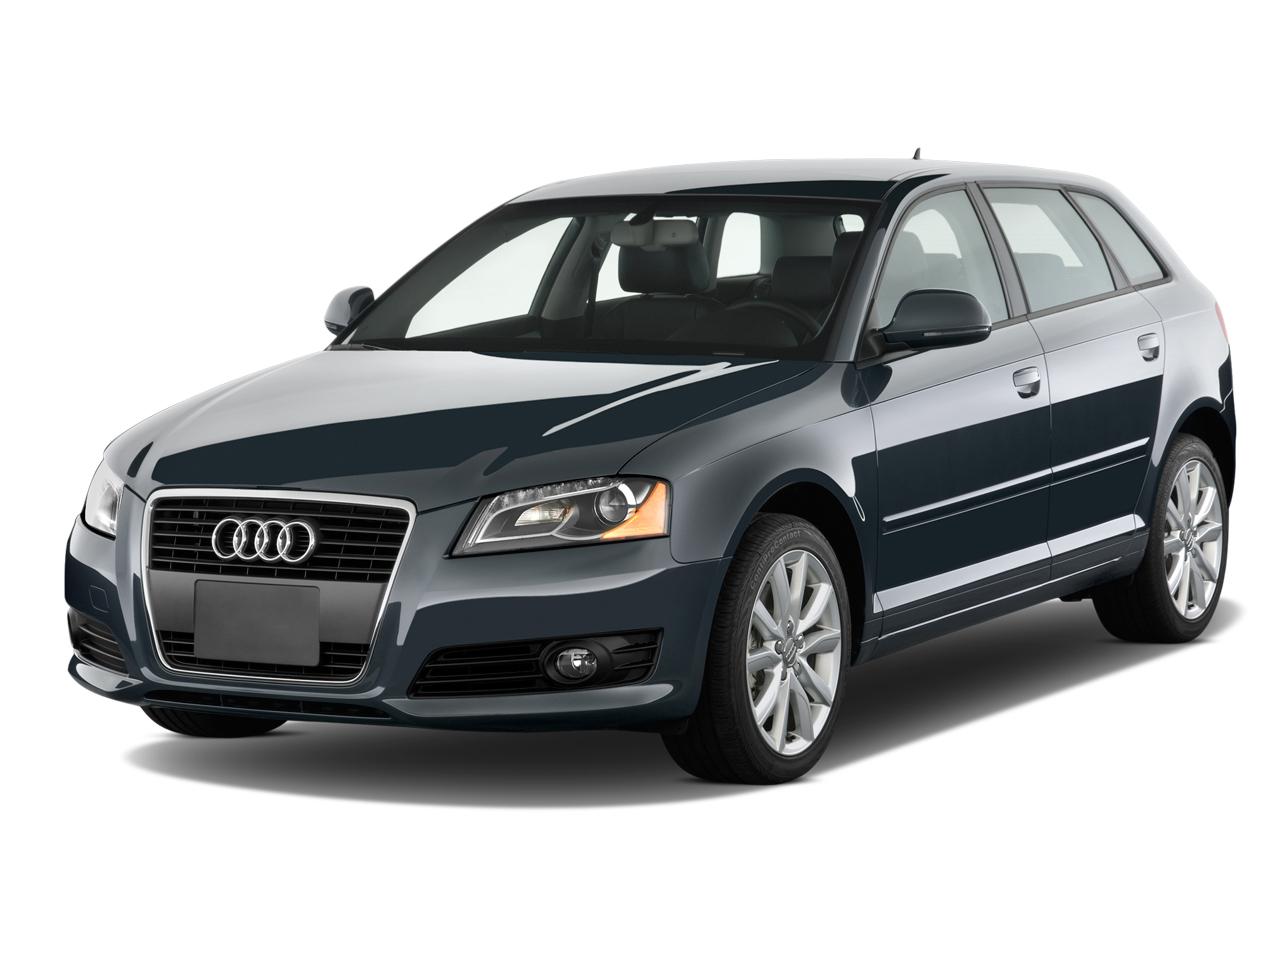 Kelebihan Audi S3 2012 Murah Berkualitas